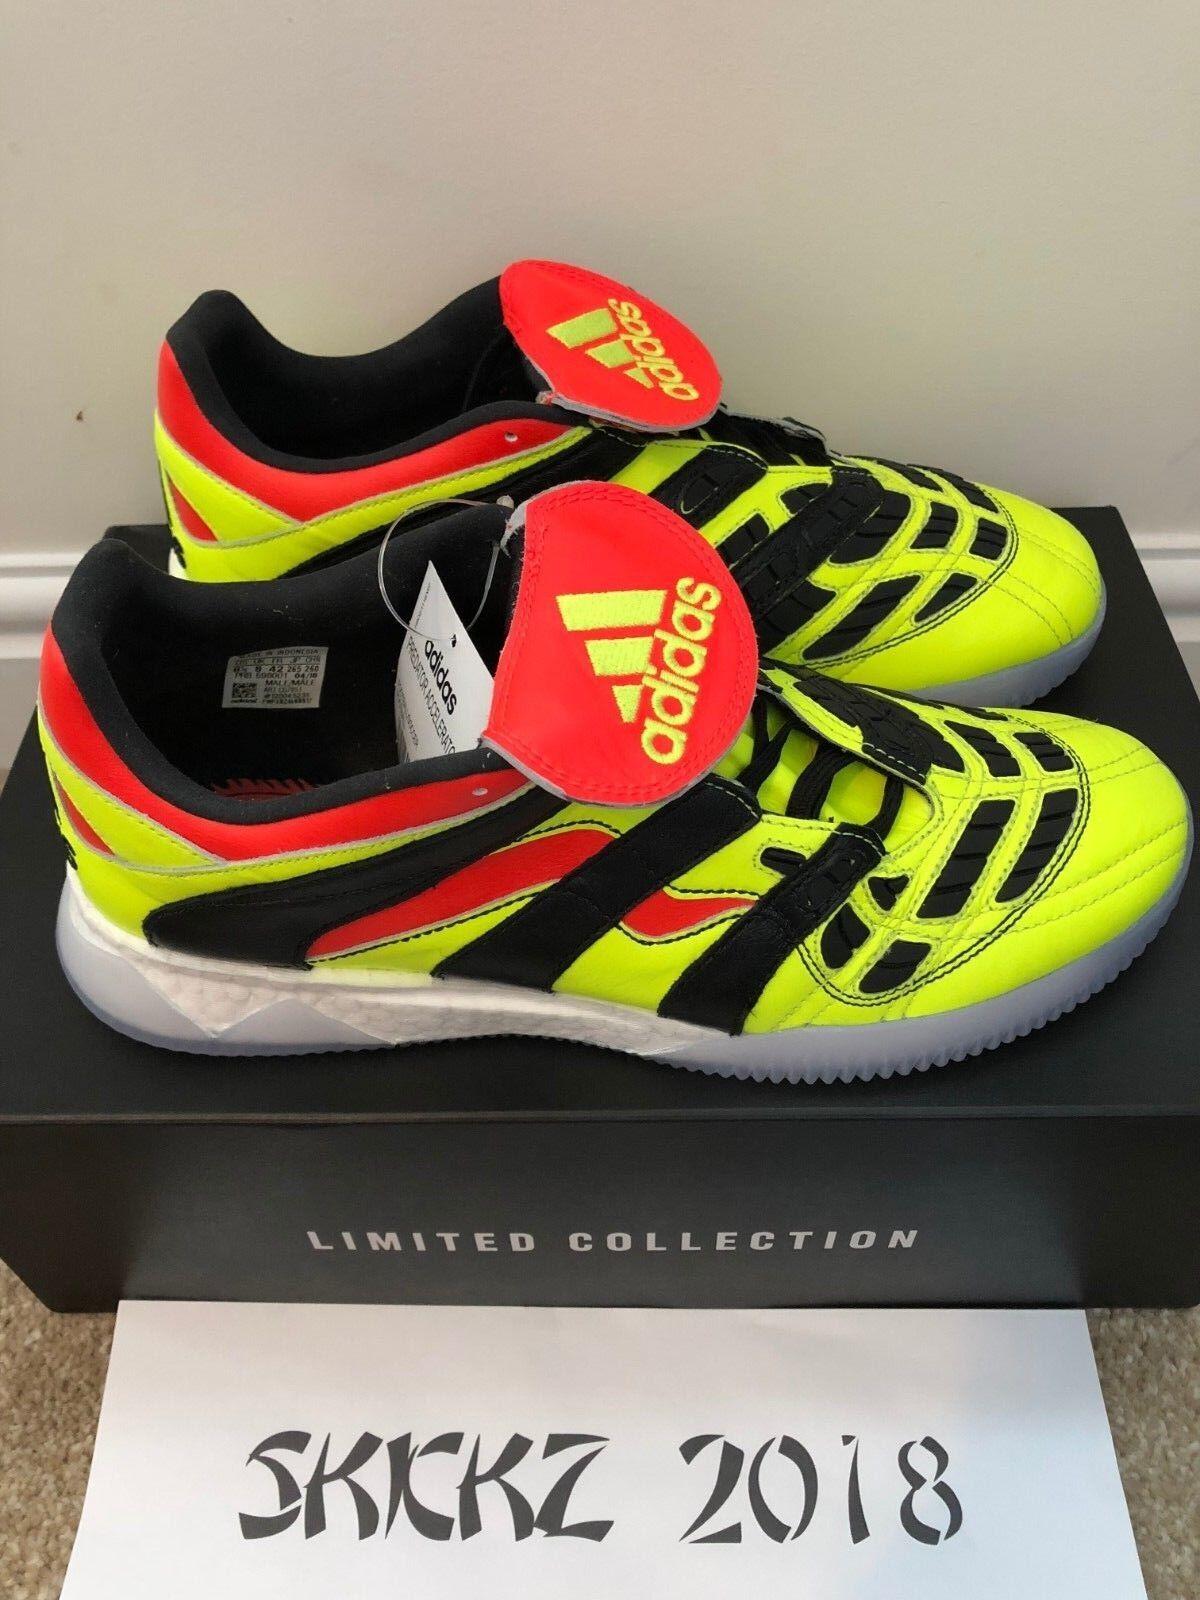 Adidas Predator Accelerator Ultra Boost UK8 2018 Mondo Cup DB